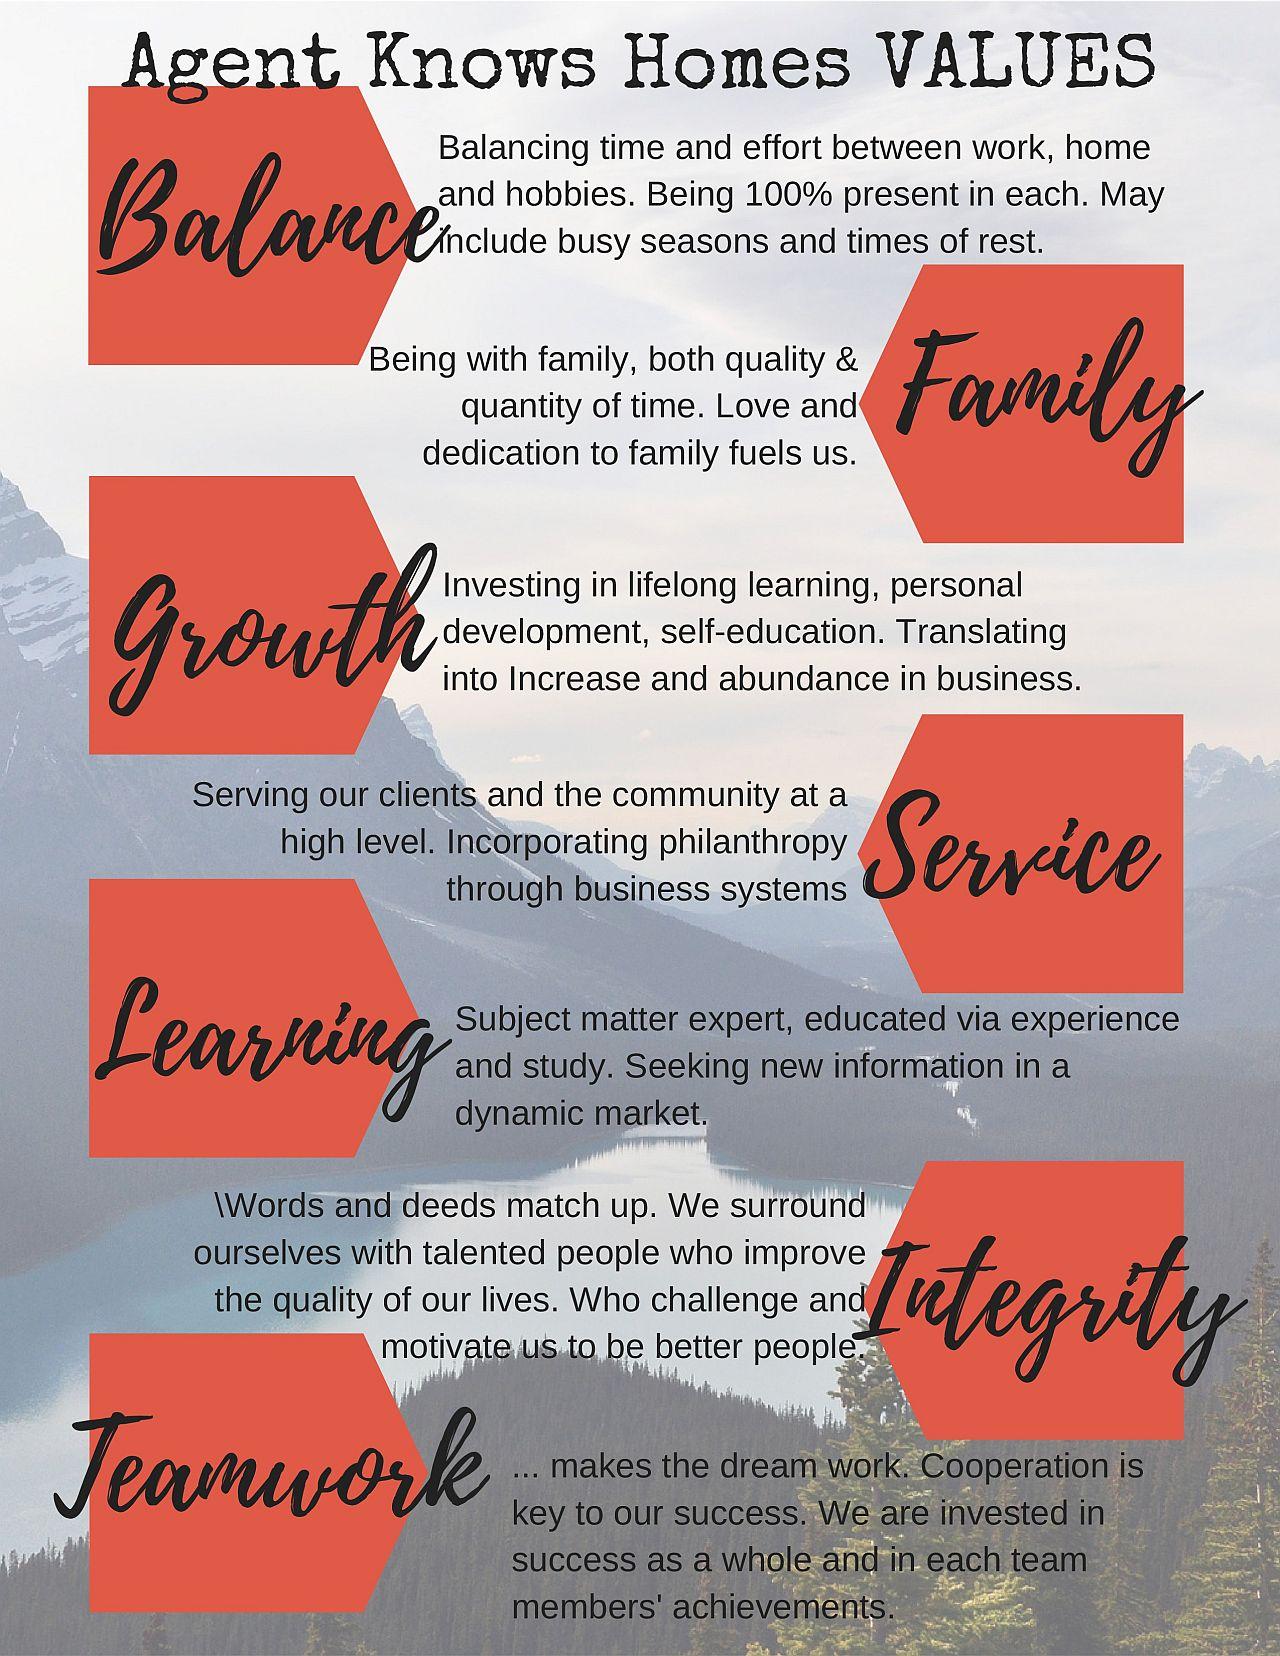 01-18-17 AKH Values